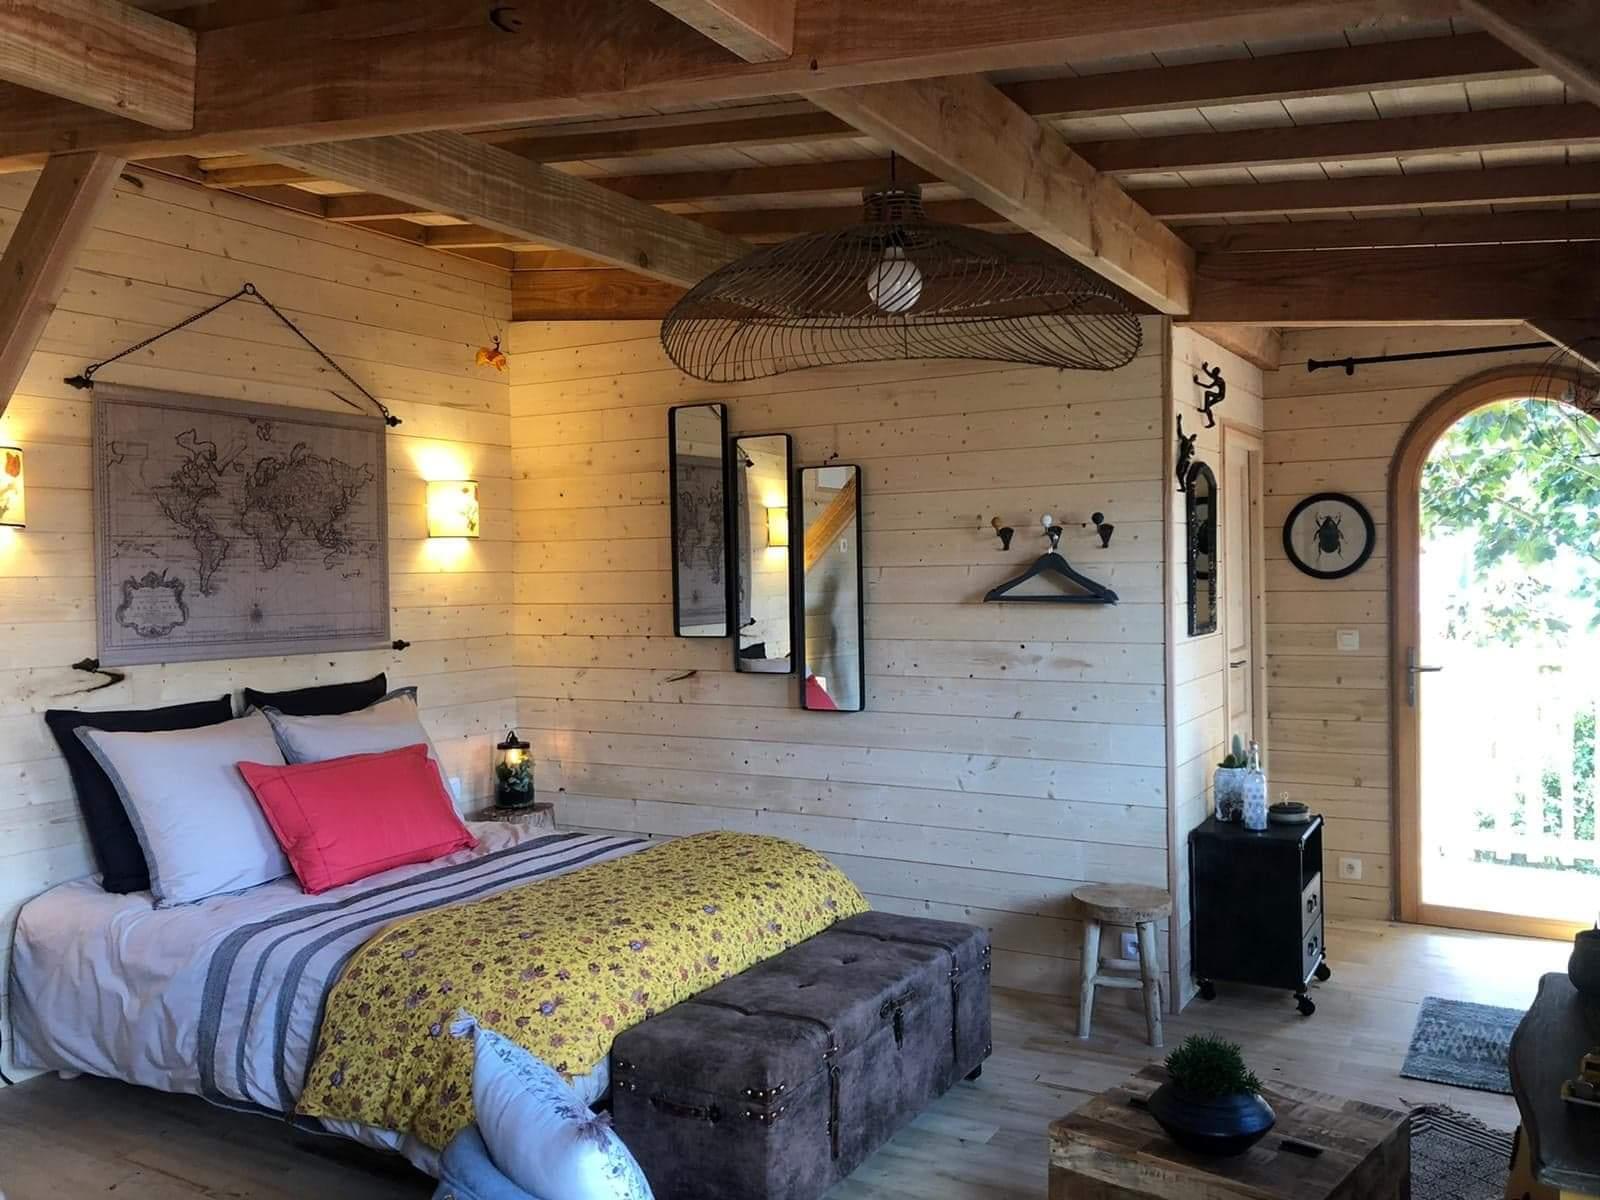 La chambre de la cabane